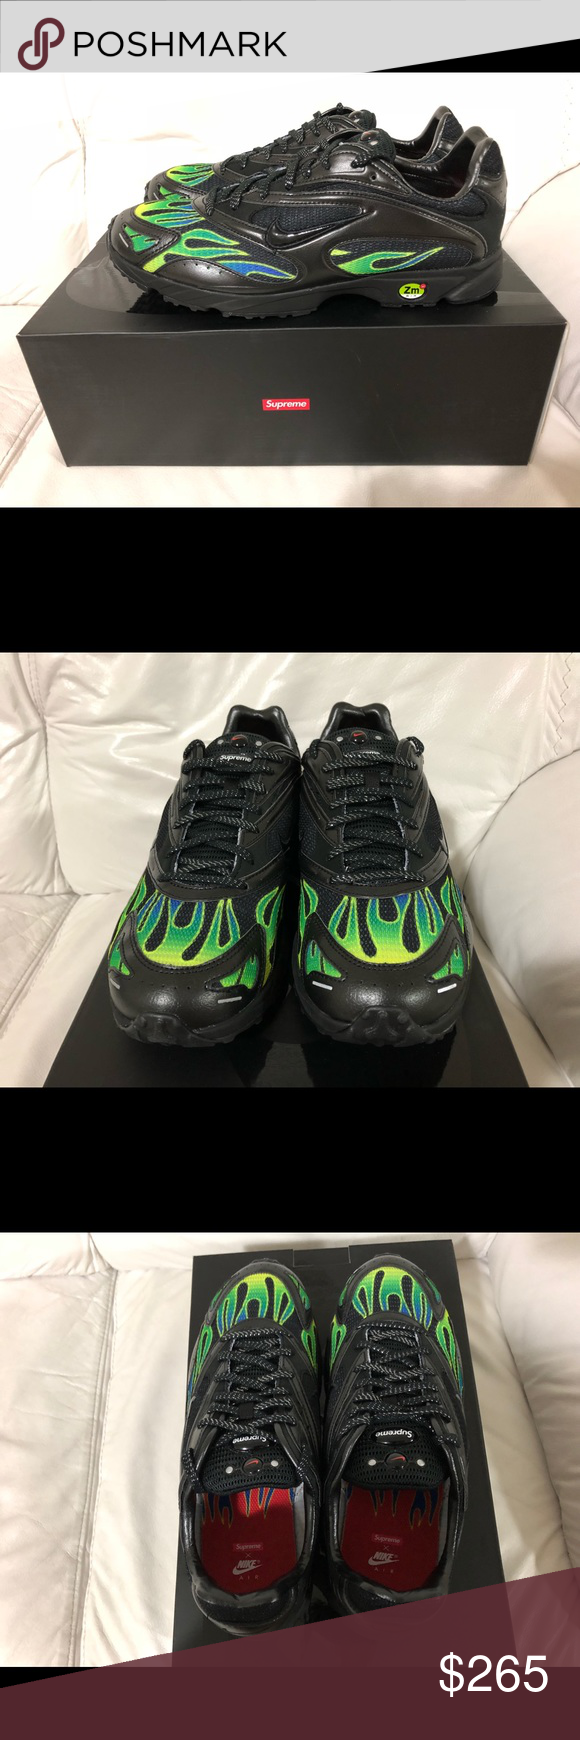 quality design 373a4 15d33 Supreme X Nike Zoom Streak Spectrum Plus Black New Supreme X Nike Zoom Streak  Spectrum Plus Black   Volt Men s Size 9.5. SS18 New w  Box and E…   Style